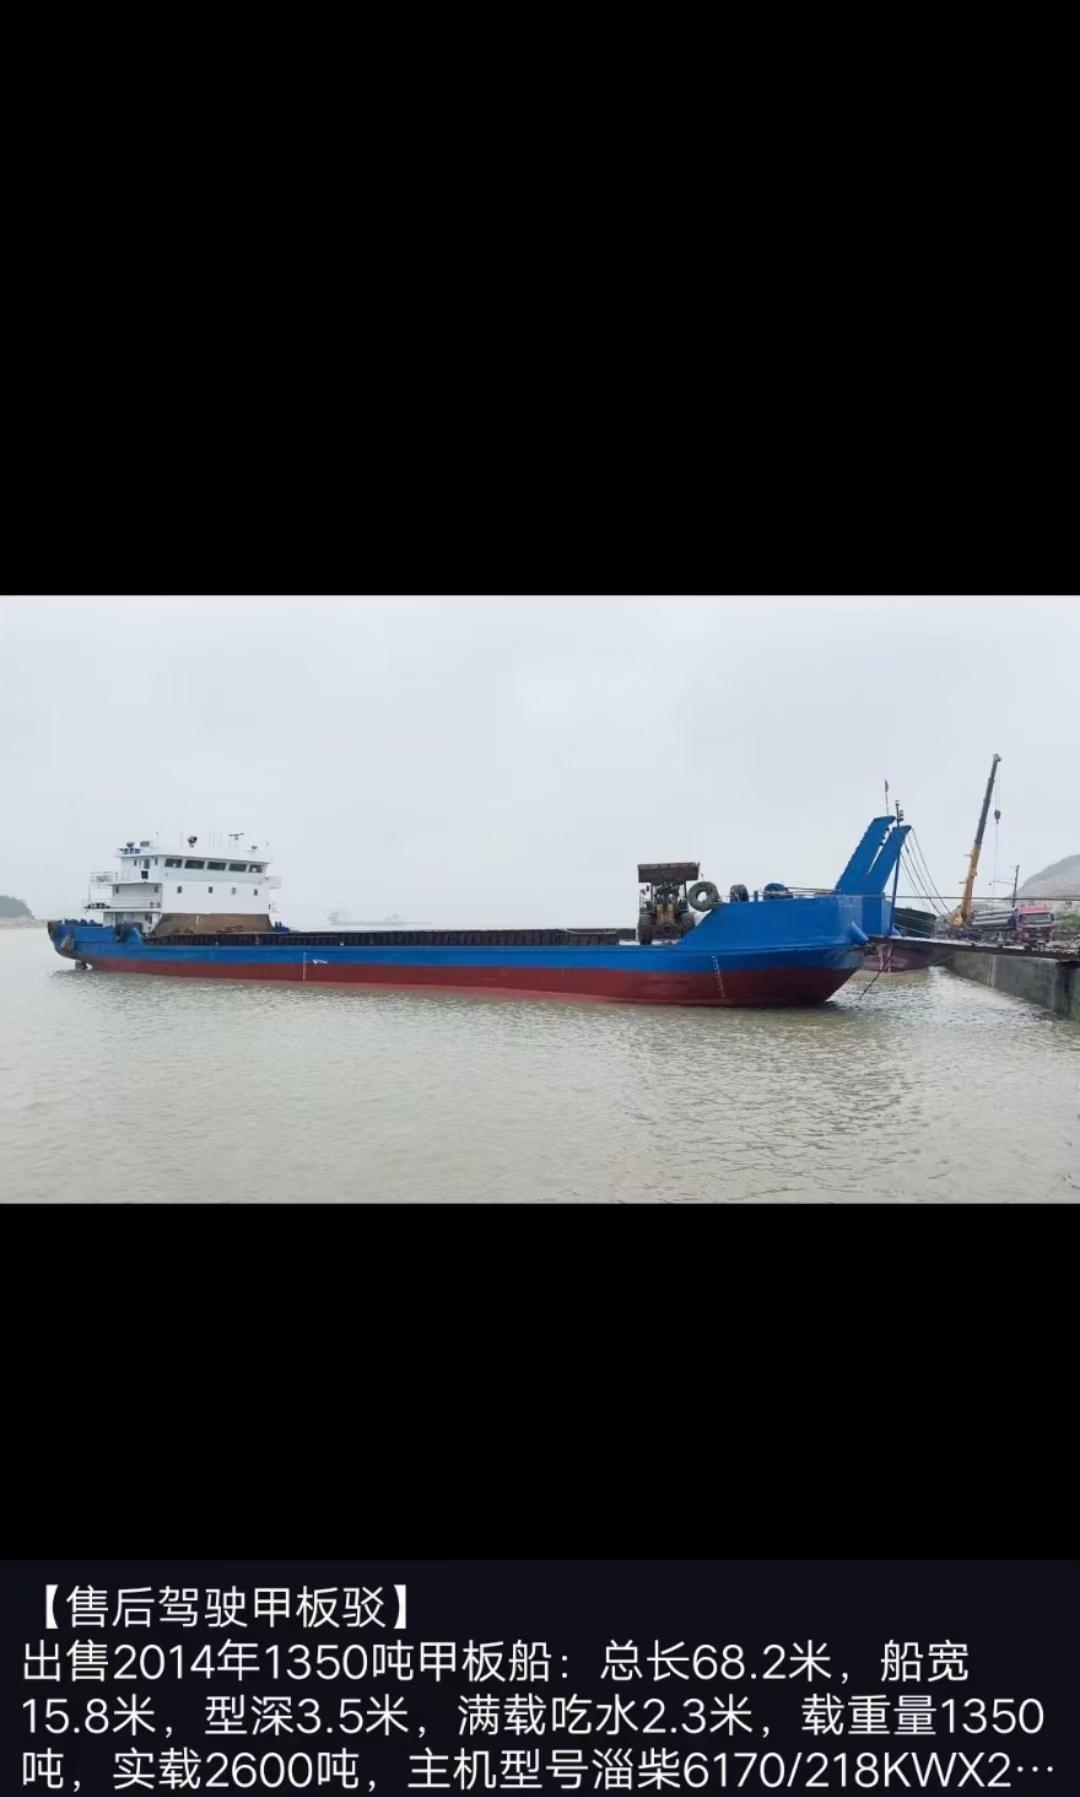 2600甲板船